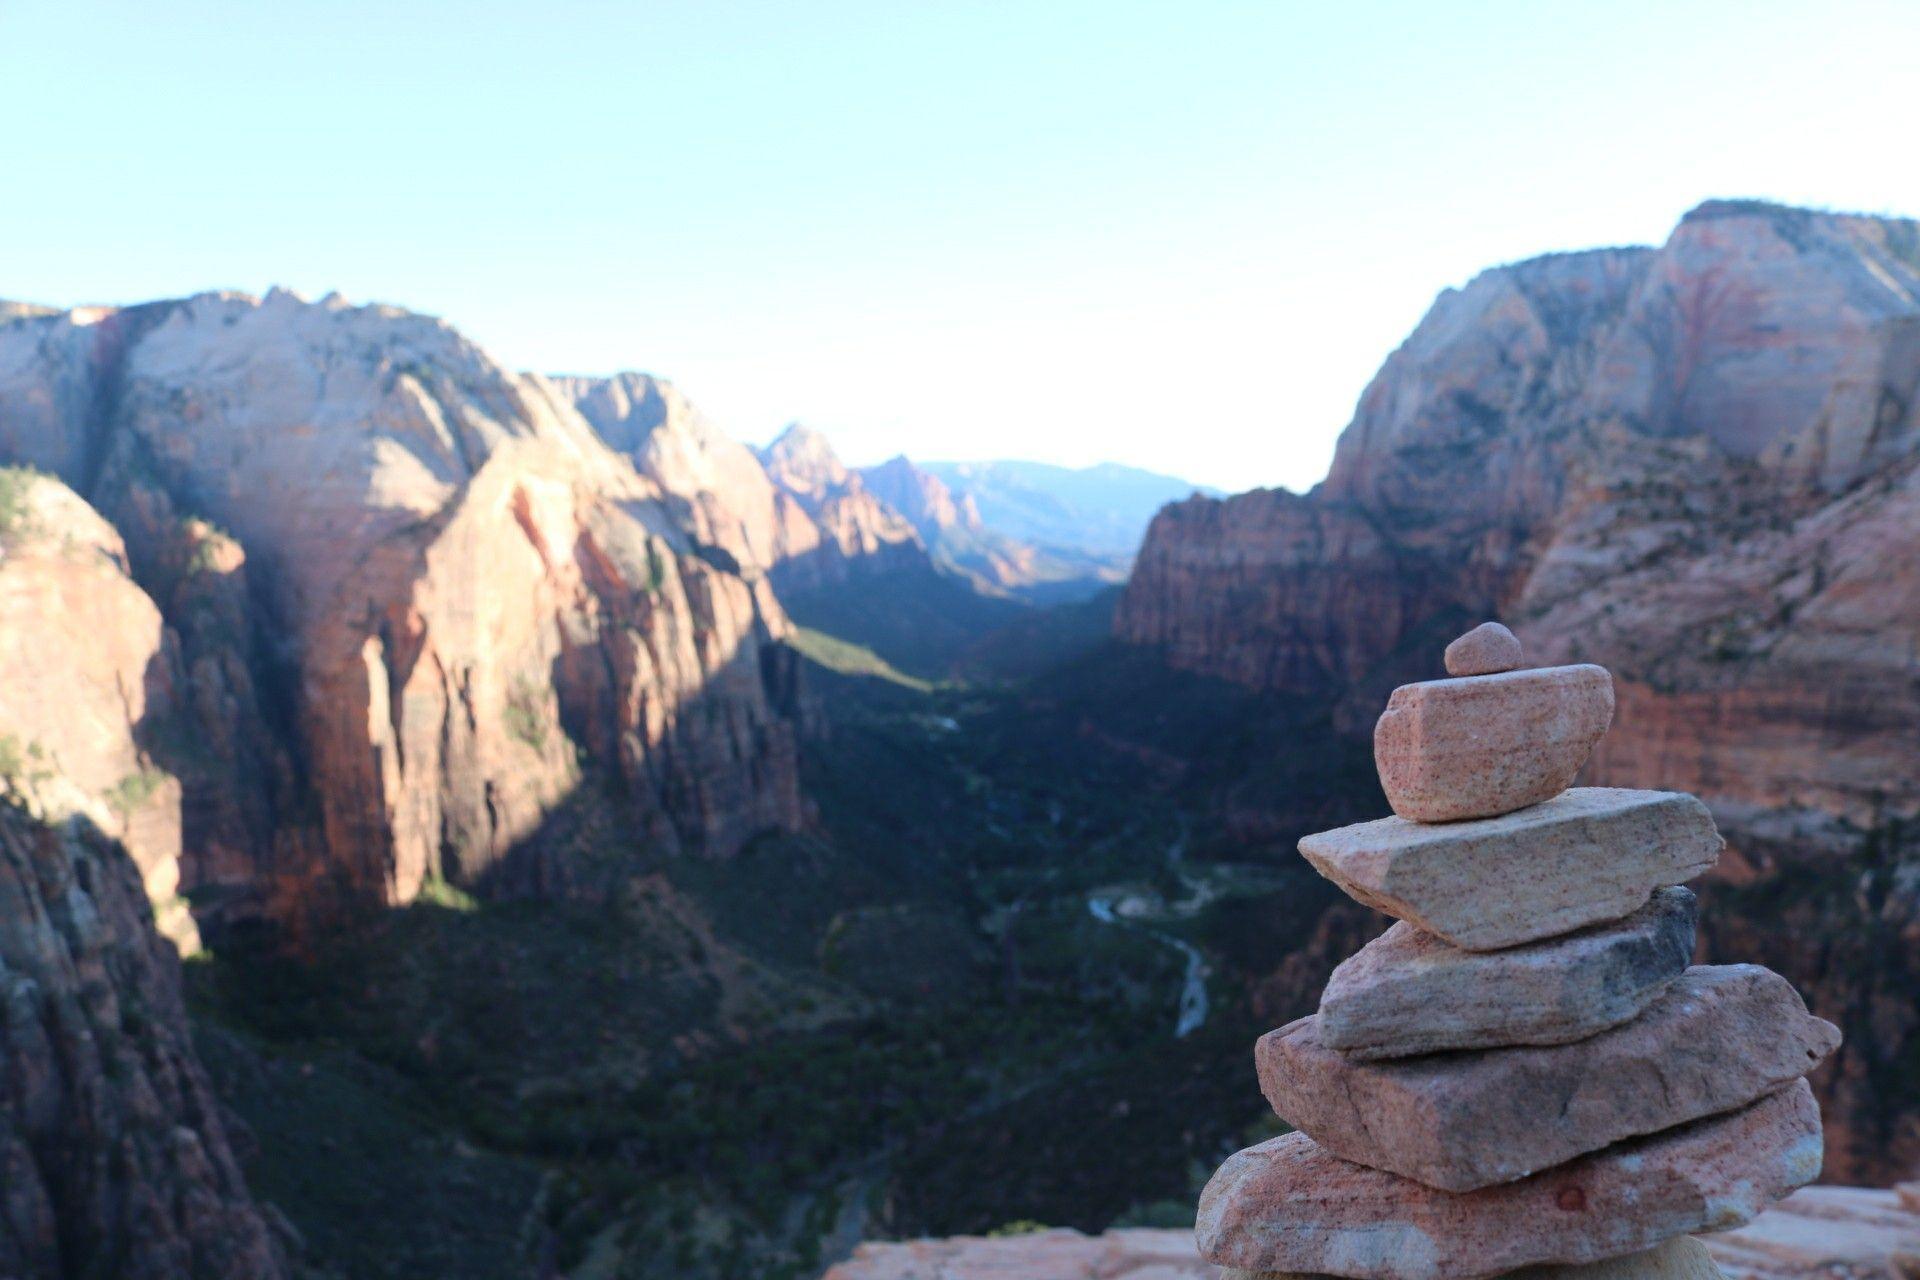 Pin by stephen vasko on national parks National parks